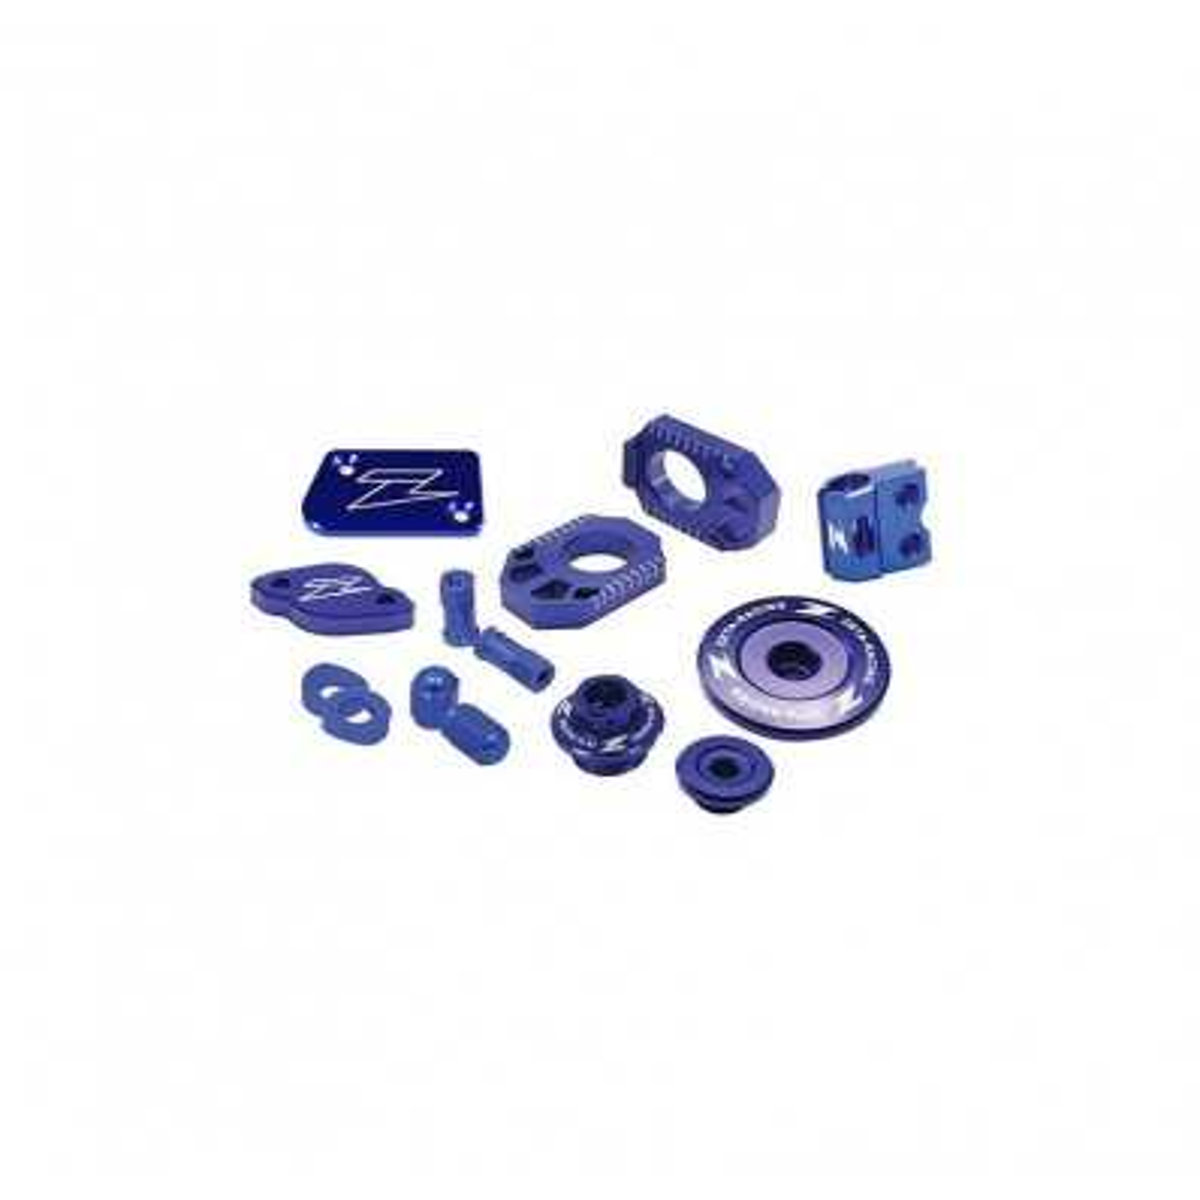 ZE51.2366 - Kit Completo Yamaha Yz250Fx´15-Yz450Fx´16 Azul